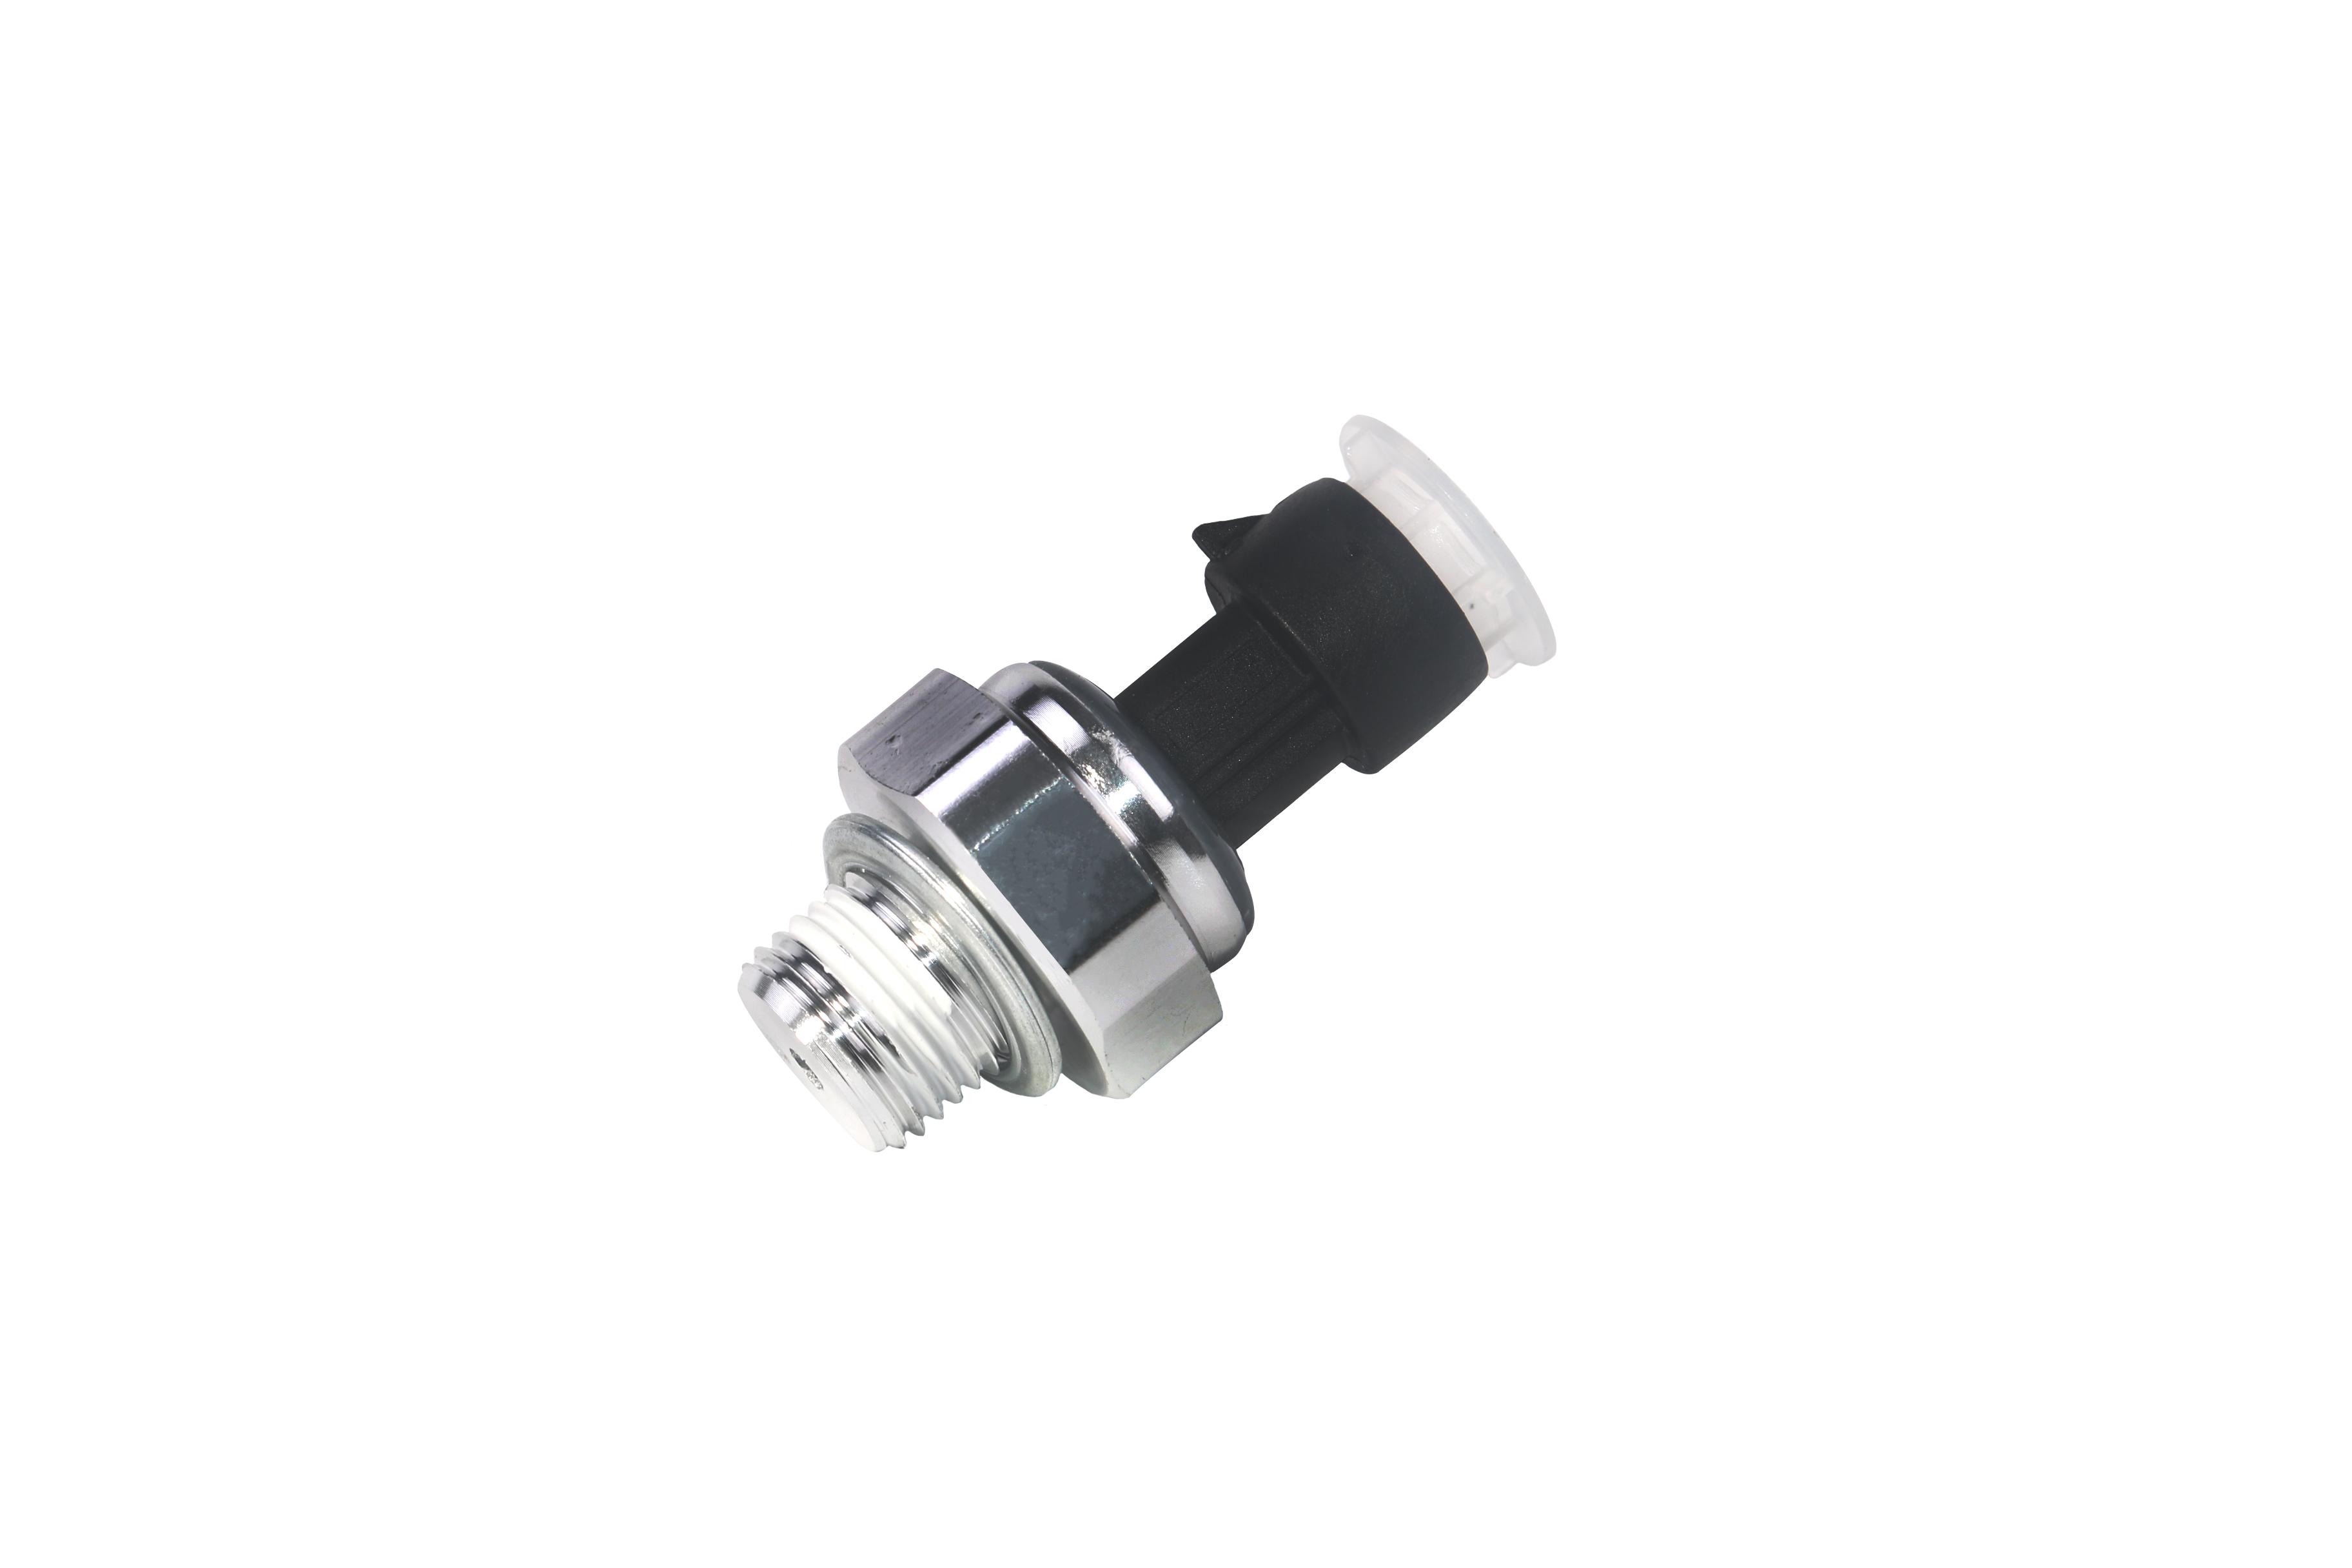 Engine Oil Pressure Sensor Switch - Replaces# 12677836, D1846A - Fits Silverado, Trailblazer, Tahoe Image